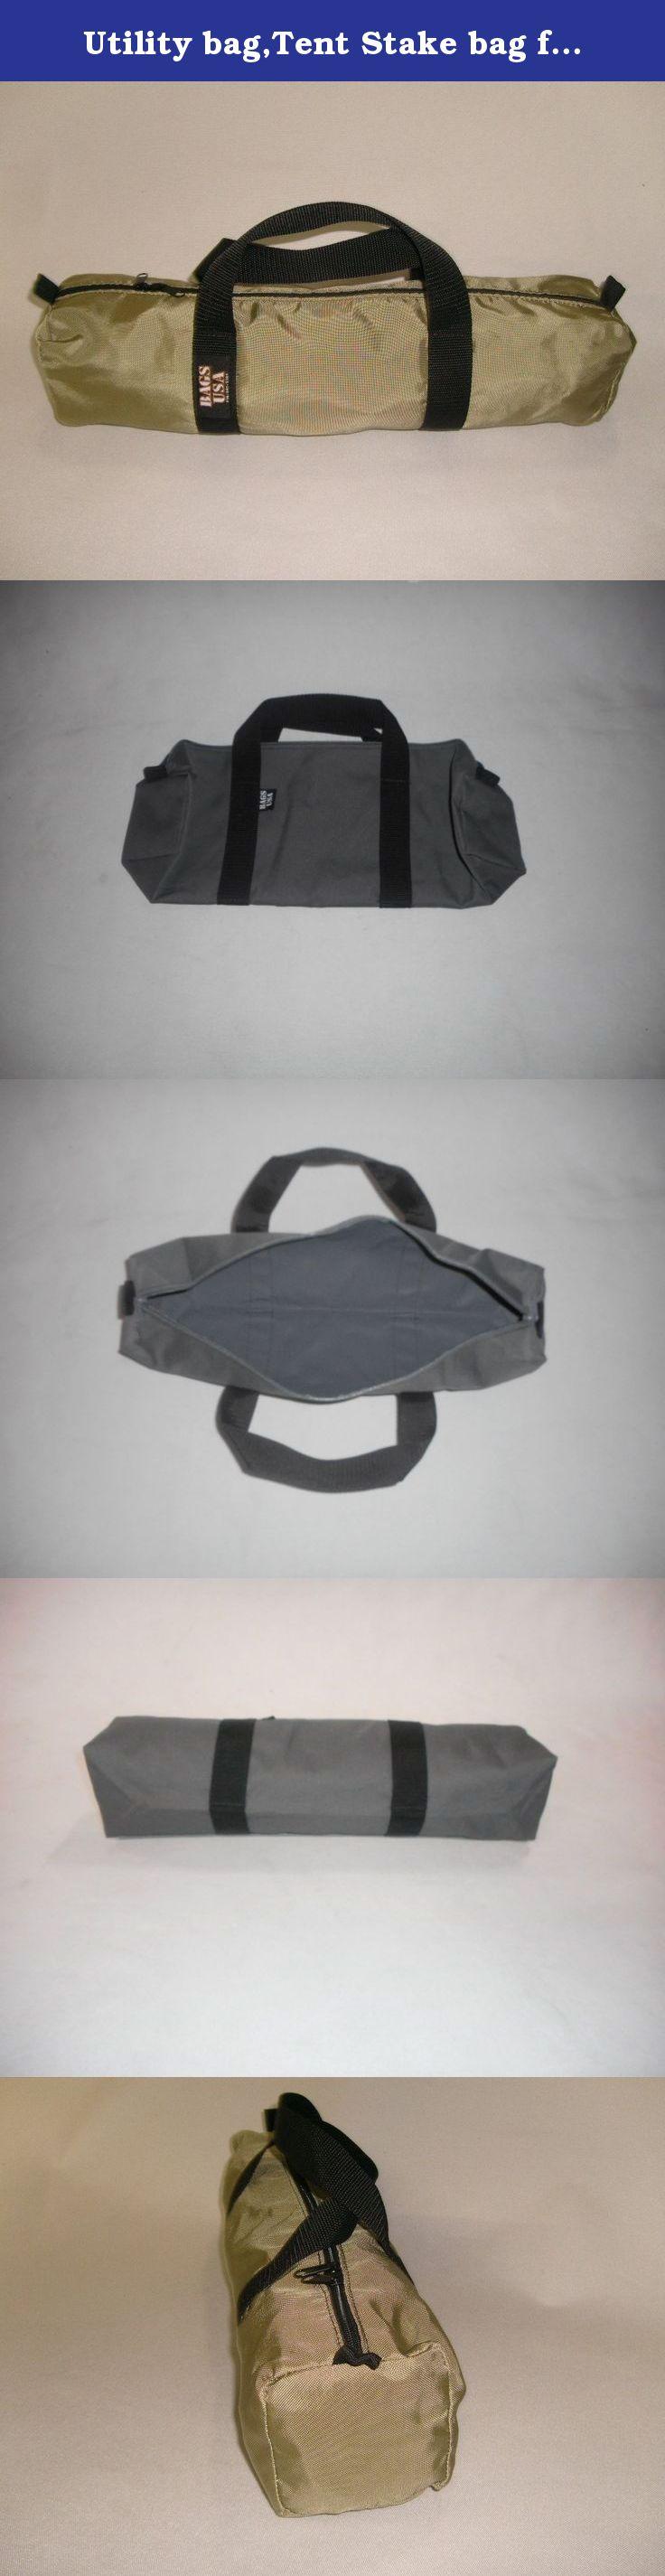 Utility bagTent Stake bag for C&ing Accessoriestripod bag 20u0027u0027 X & Utility bagTent Stake bag for Camping Accessoriestripod bag 20 ...